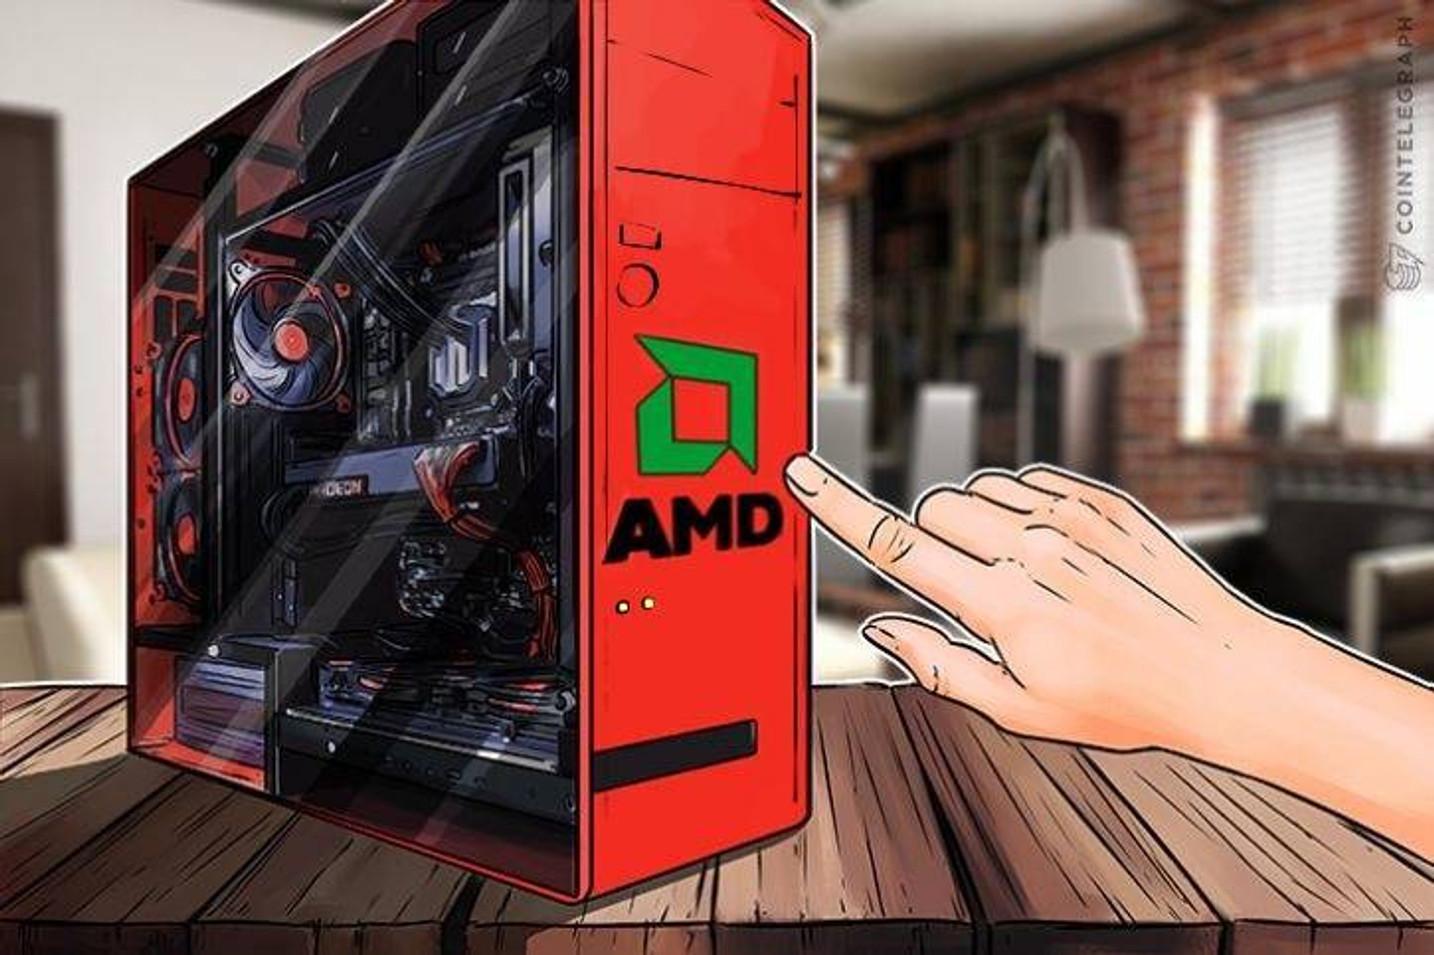 AMD: 'Blockchain-Related GPU Sales in Third Quarter Were Negligible'